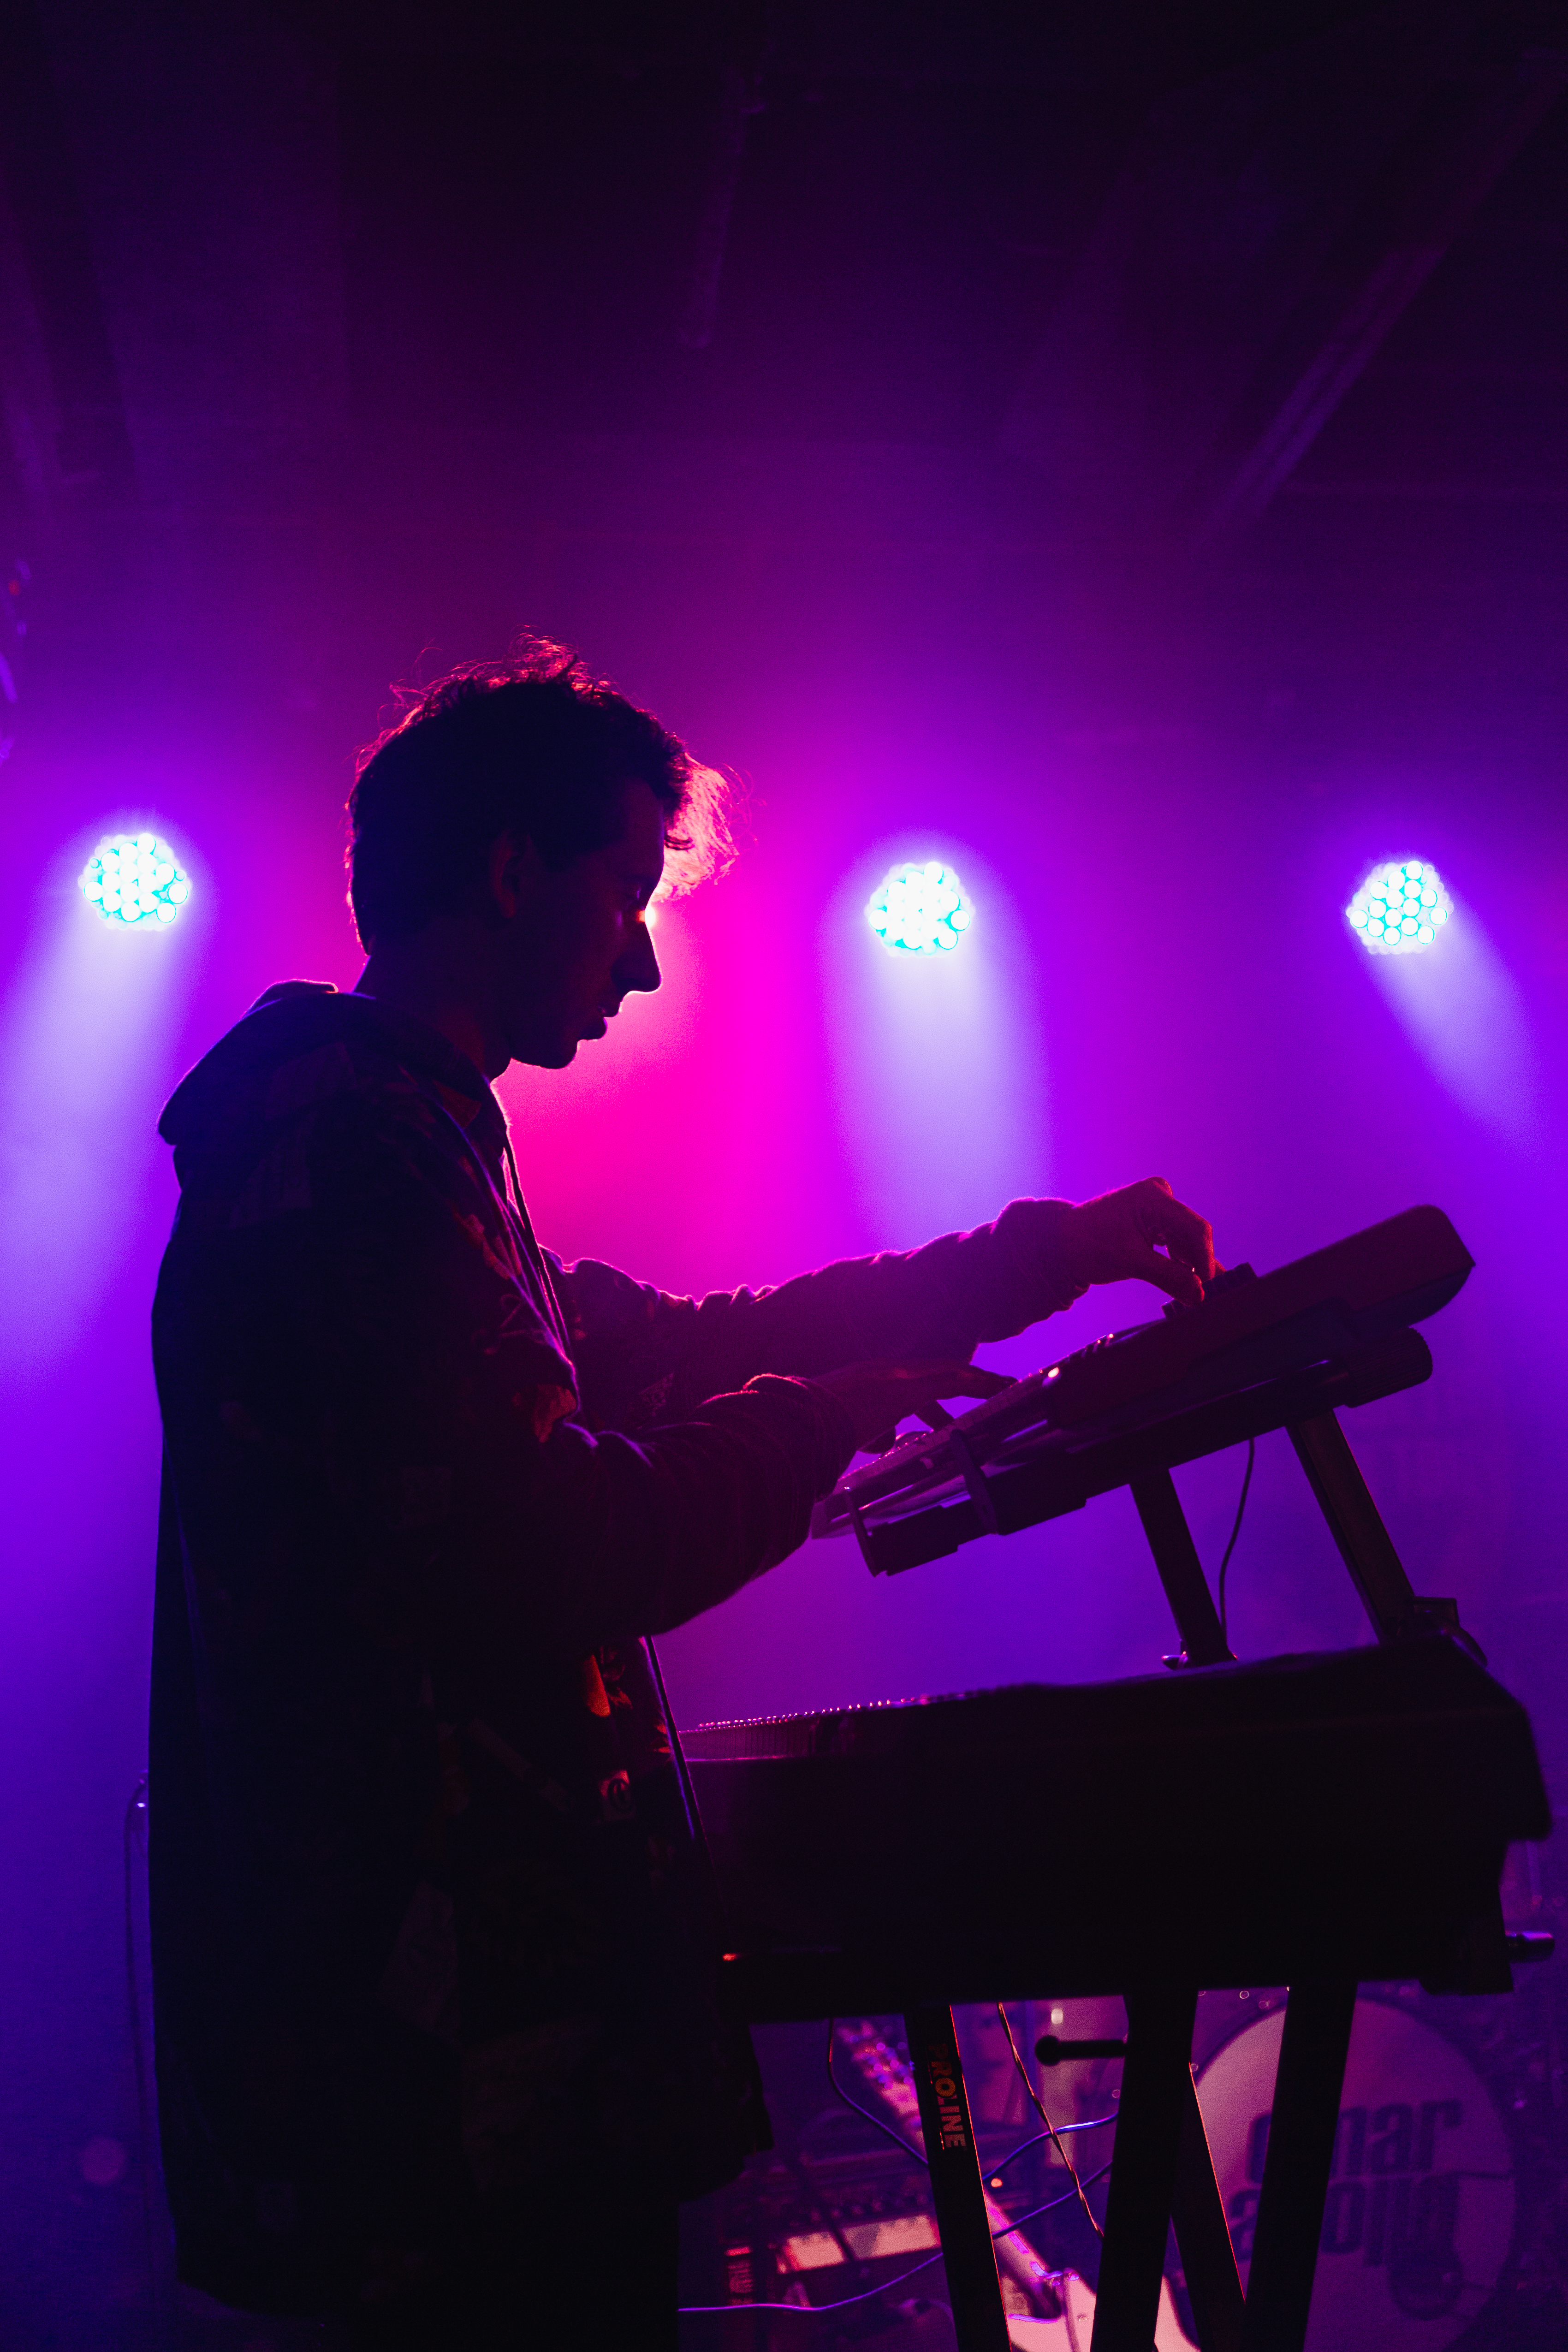 Man holding DJ mixer machine